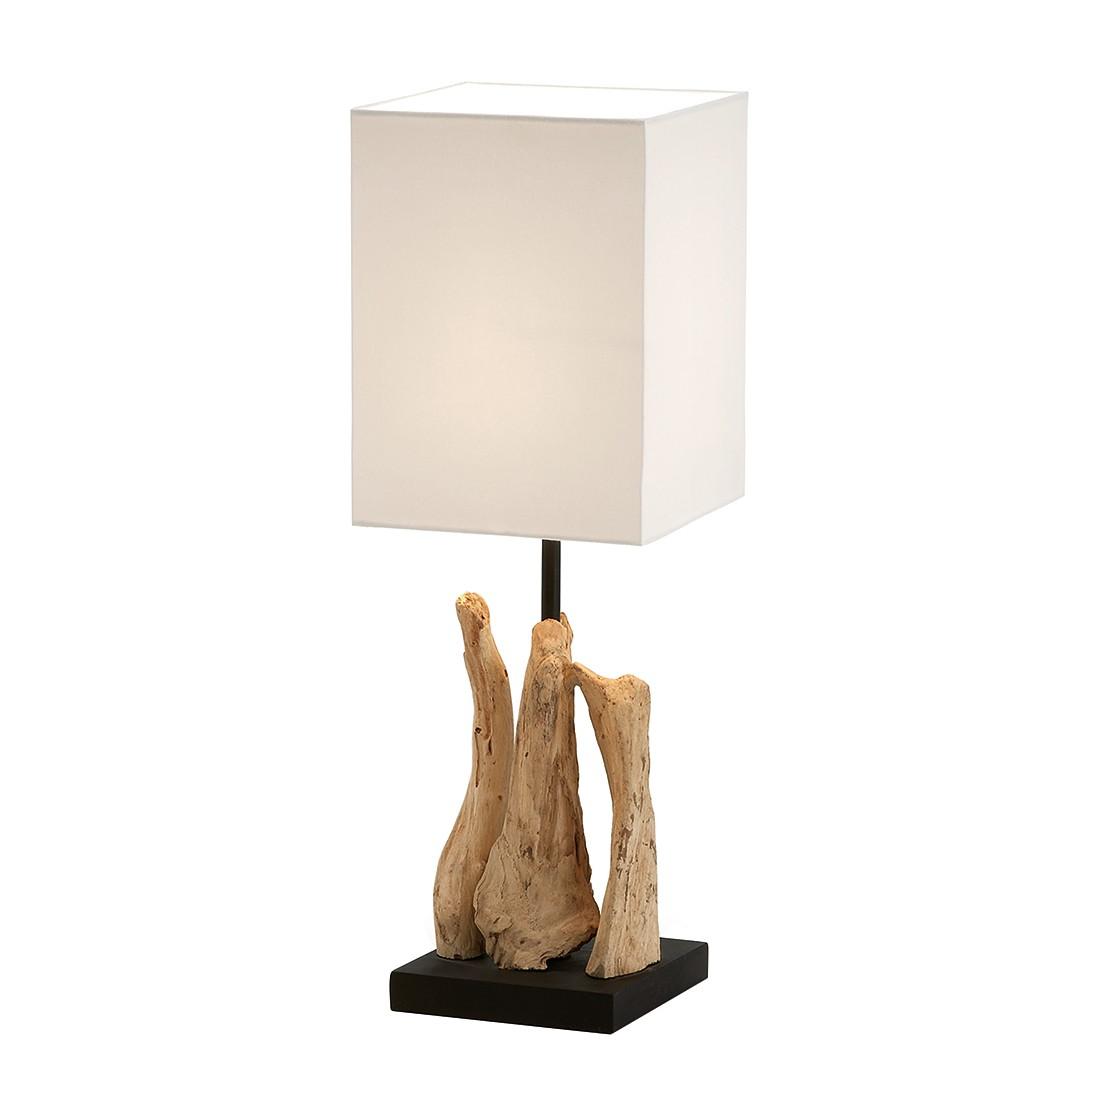 EEK A++, Lampe de table Butler by Julià - Bois / Tissu 1 ampoule, Naturoo